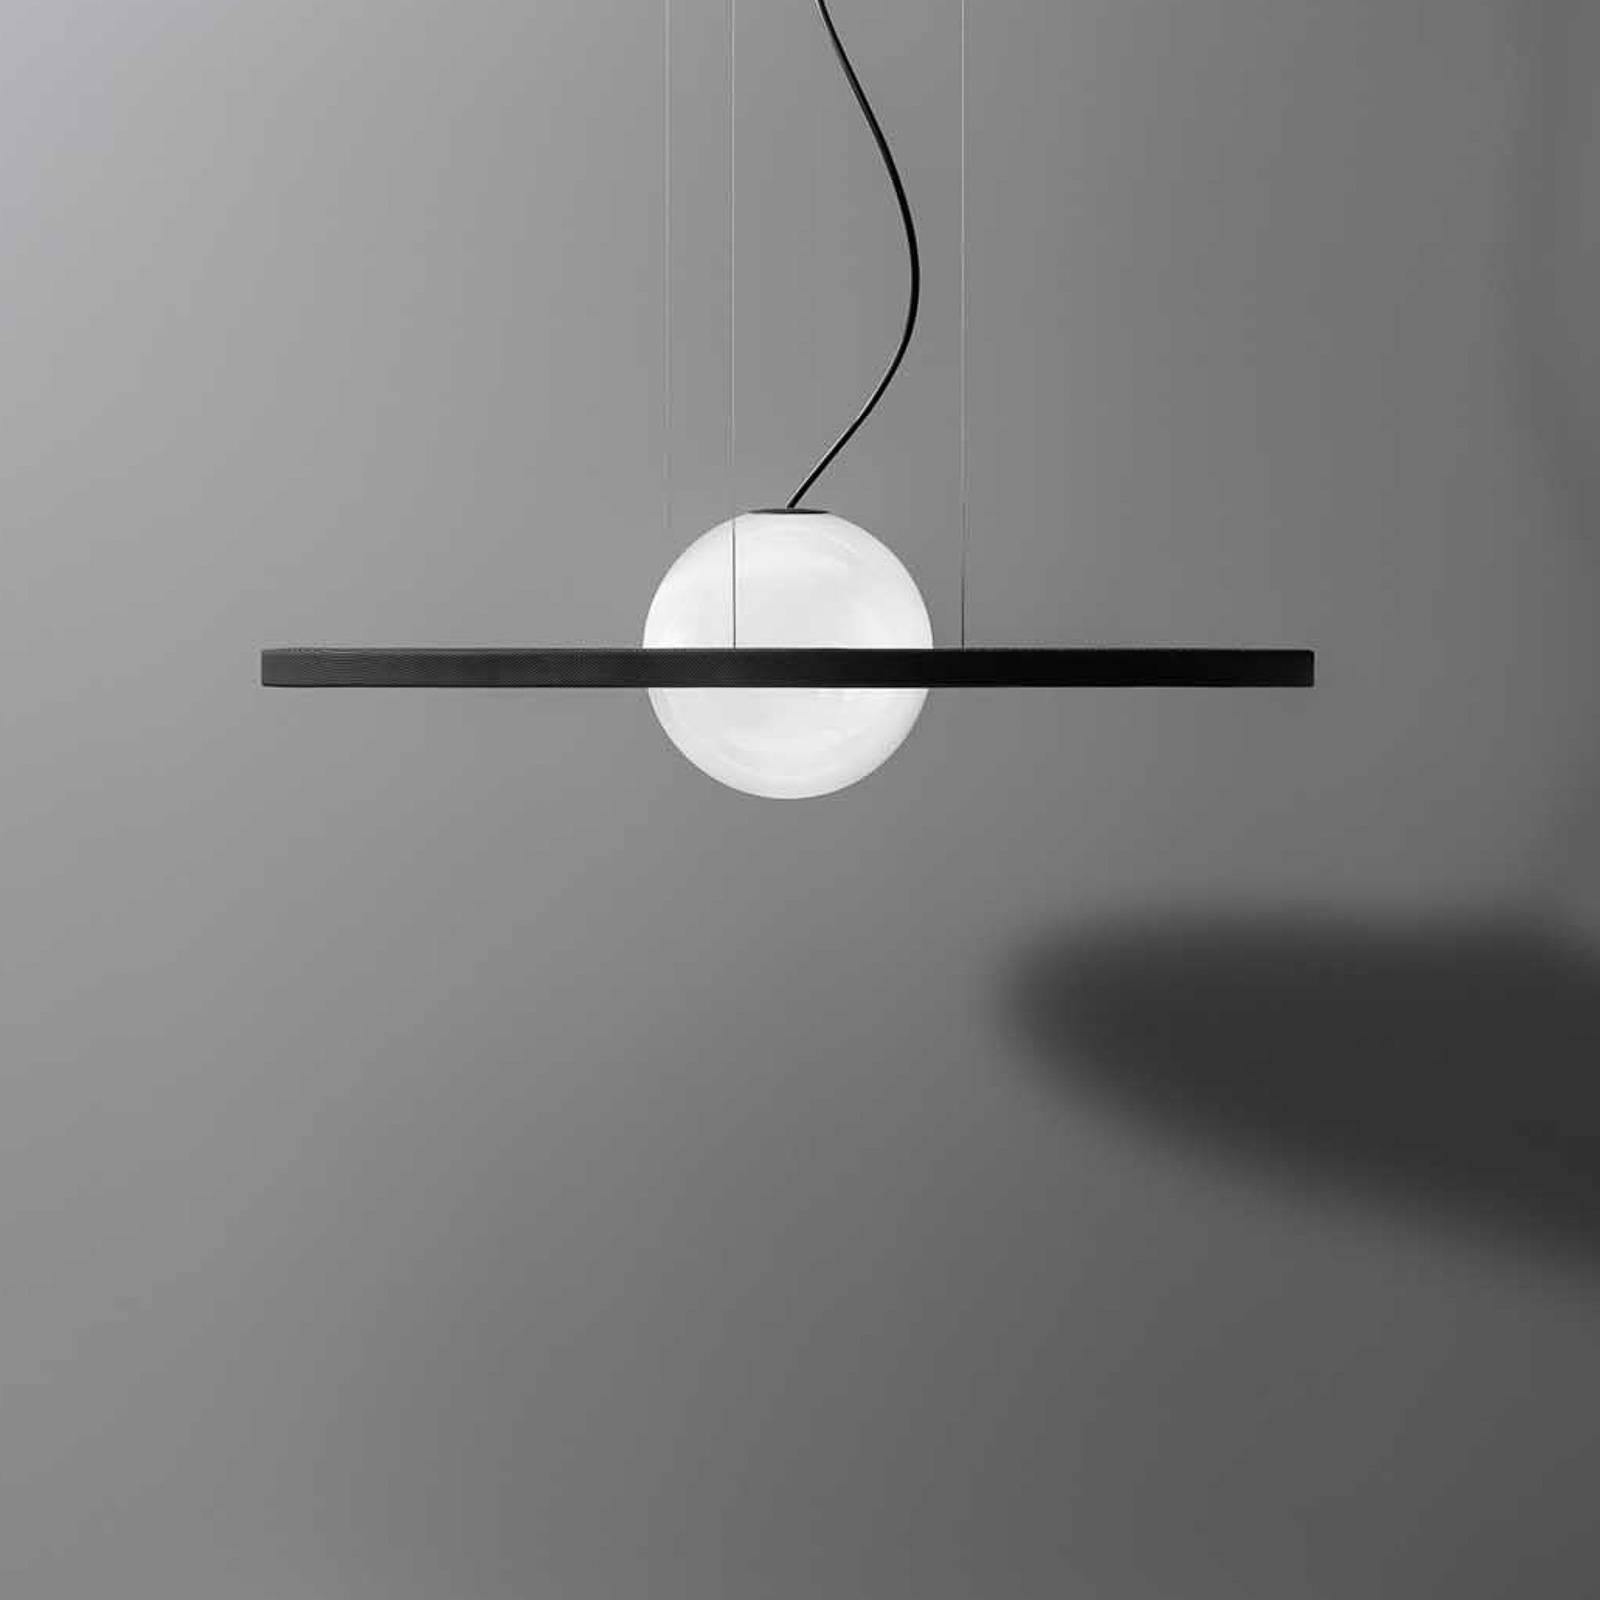 OLEV Irving Silence lampa wisząca, tłumiąca hałas